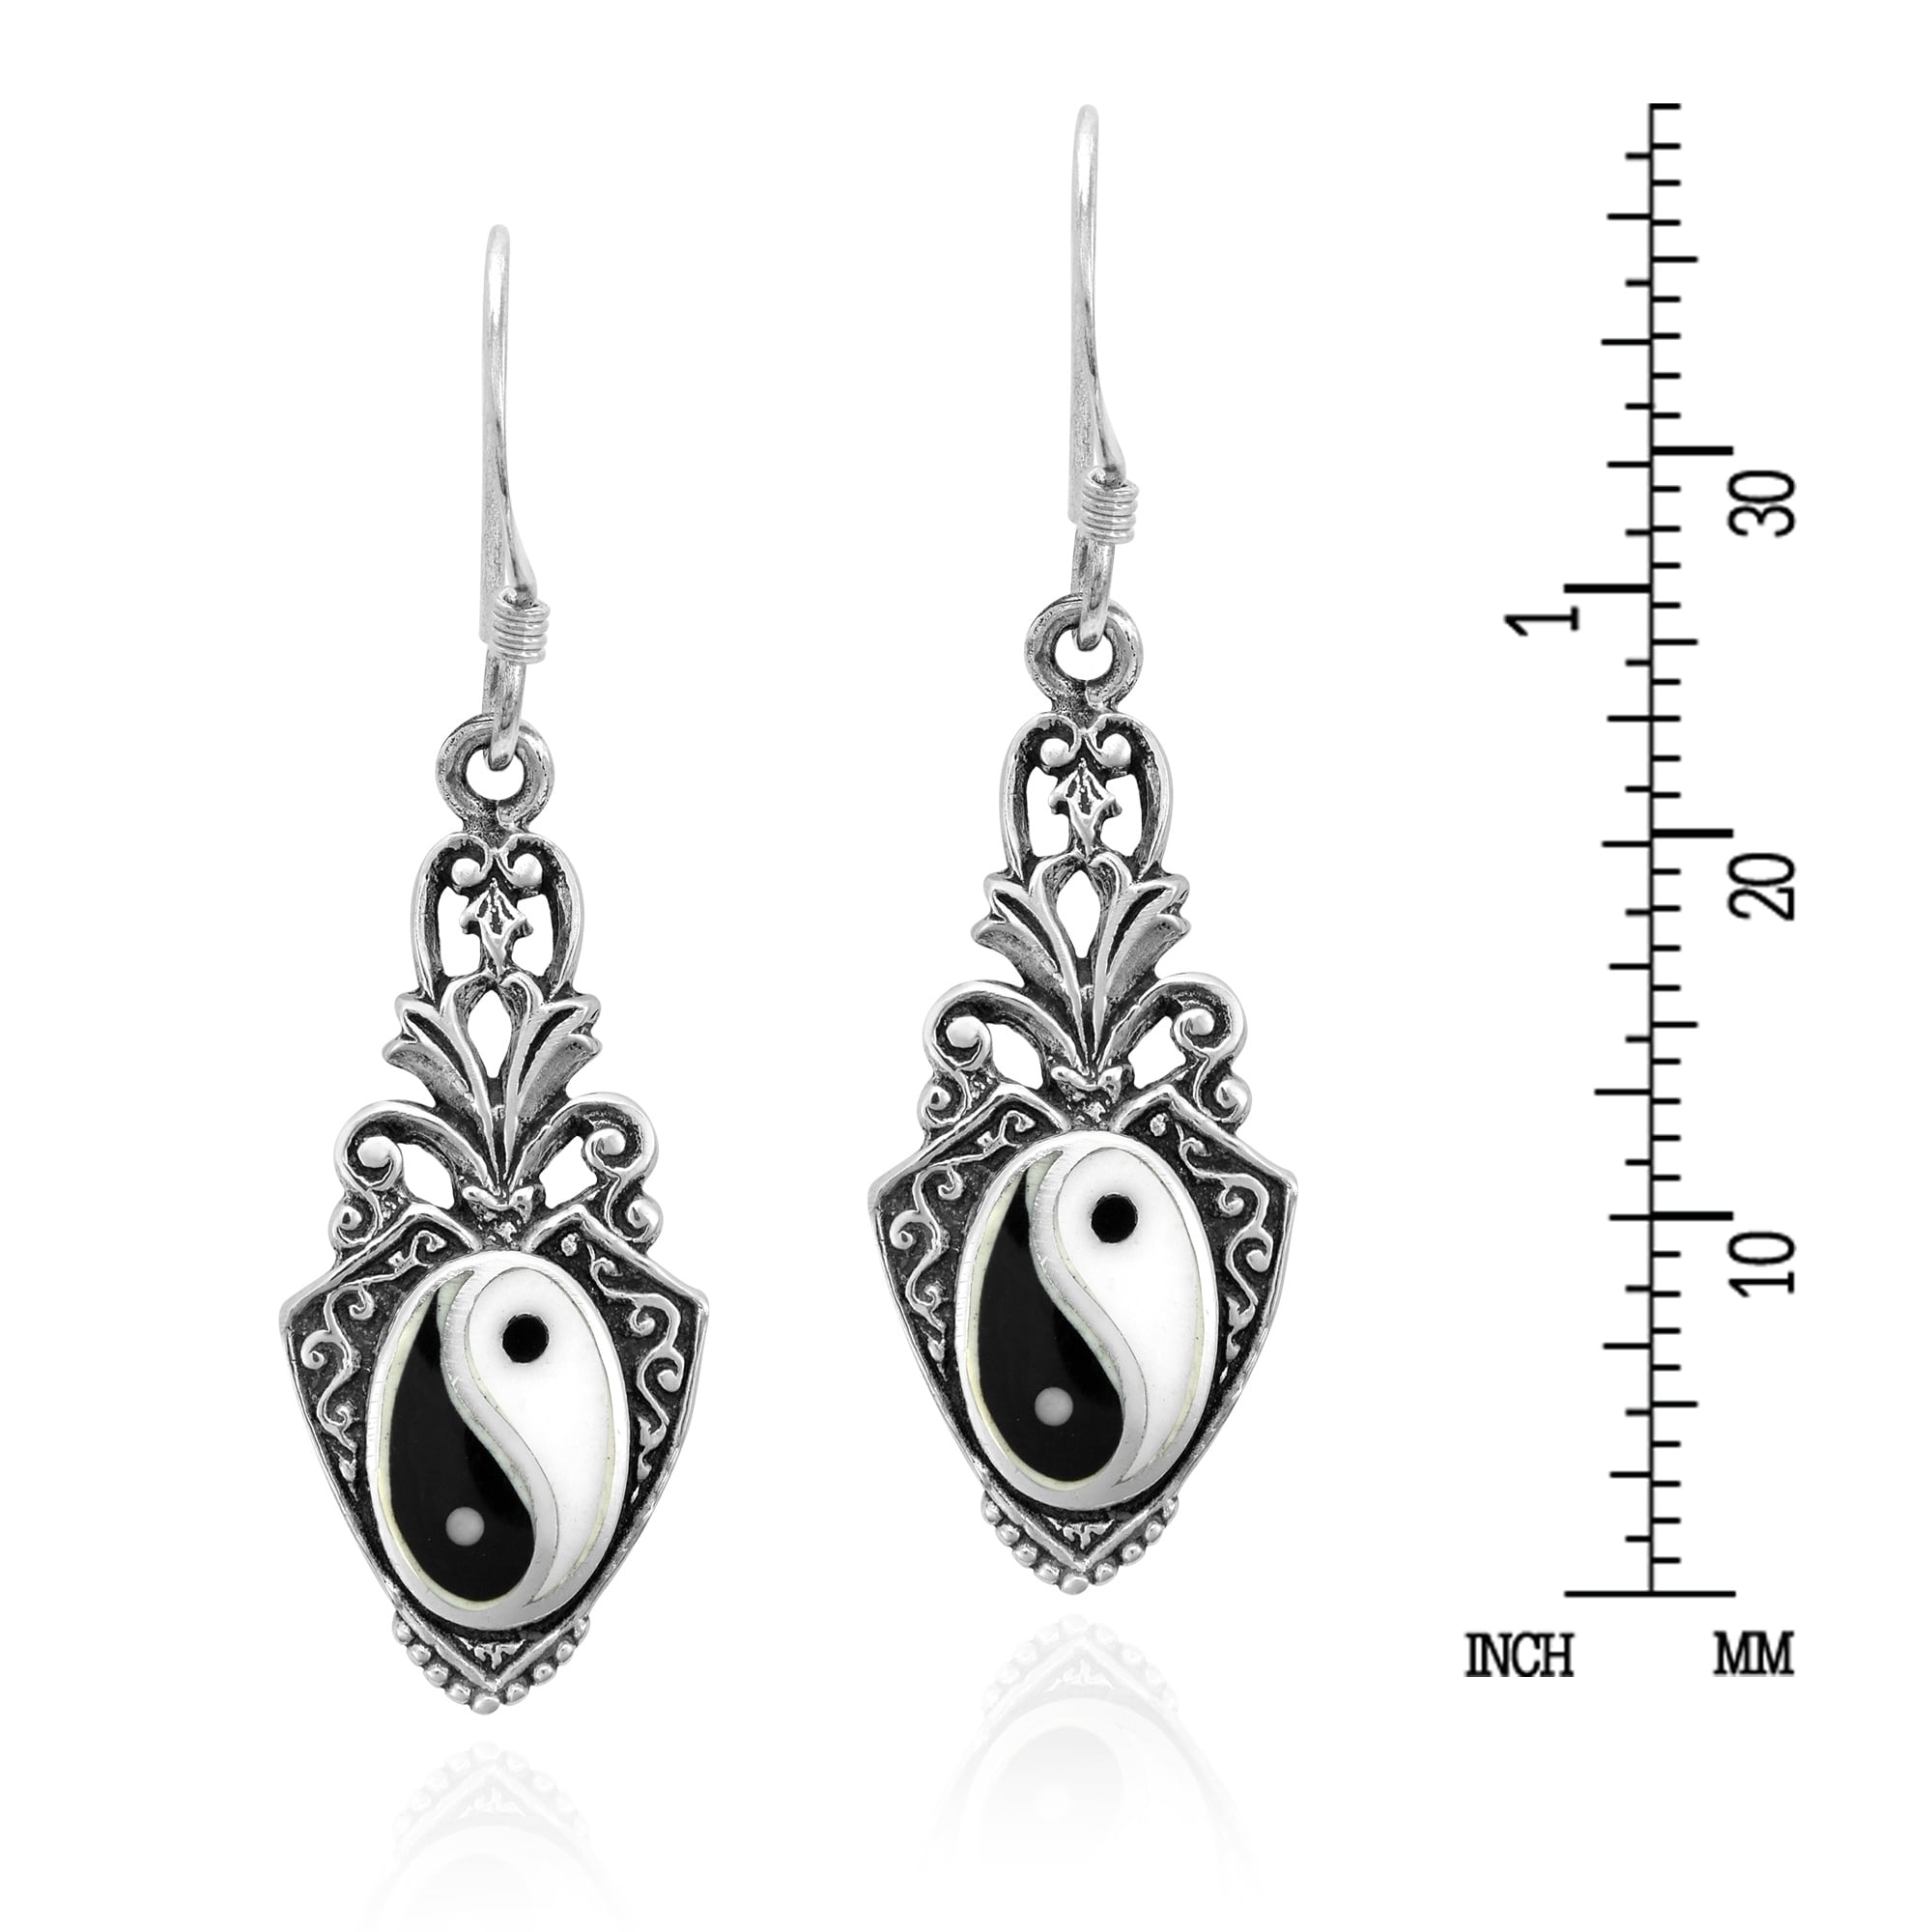 57ffcf837 Handmade Vintage Style Balance of Life Yin Yang Symbol Sterling Silver  Dangle Earrings (Thailand)